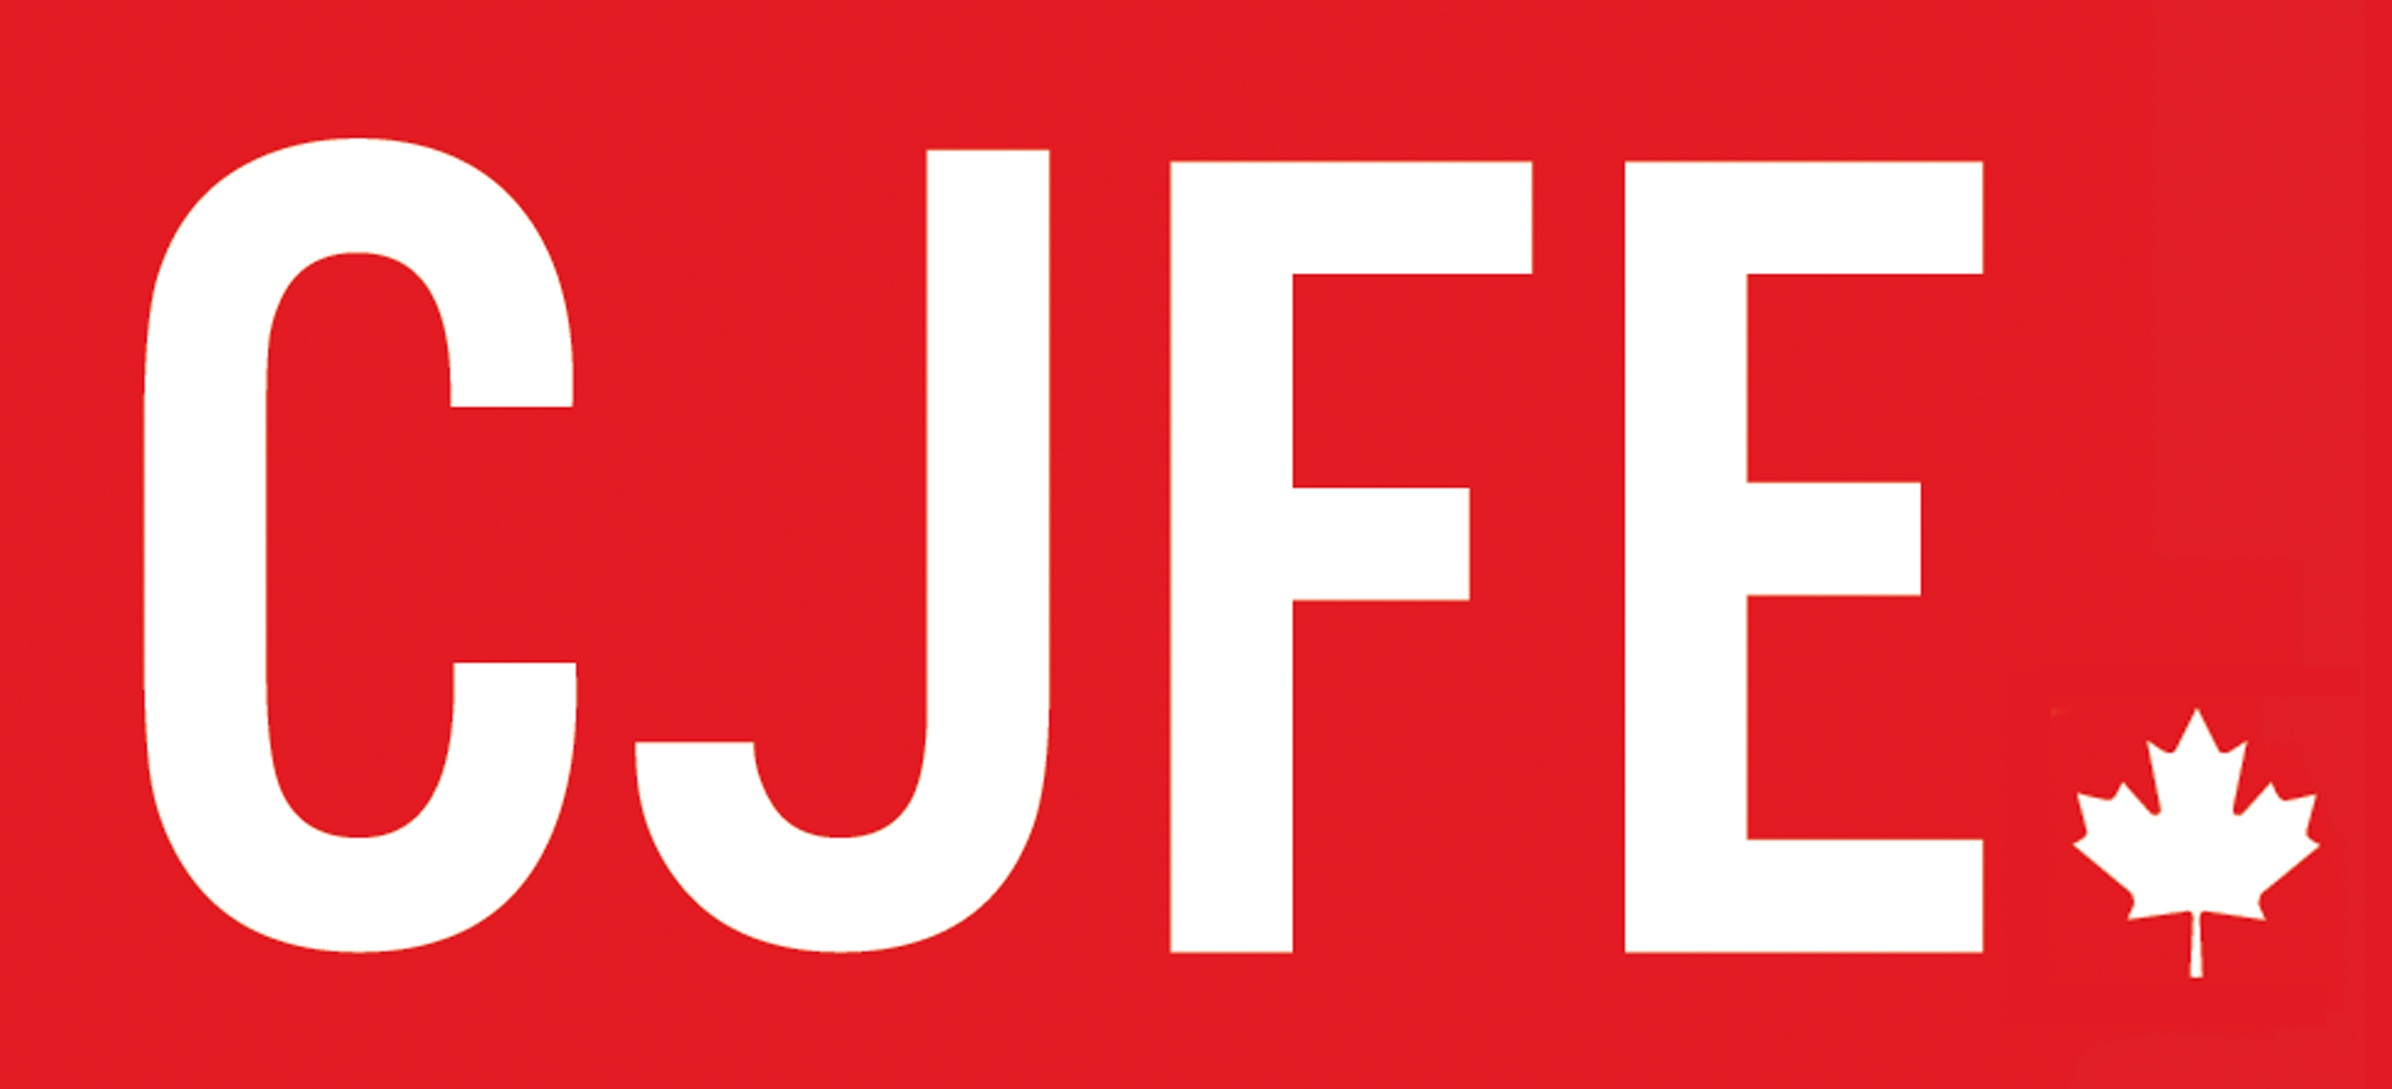 CJFE_Logo_Rectangular.jpg